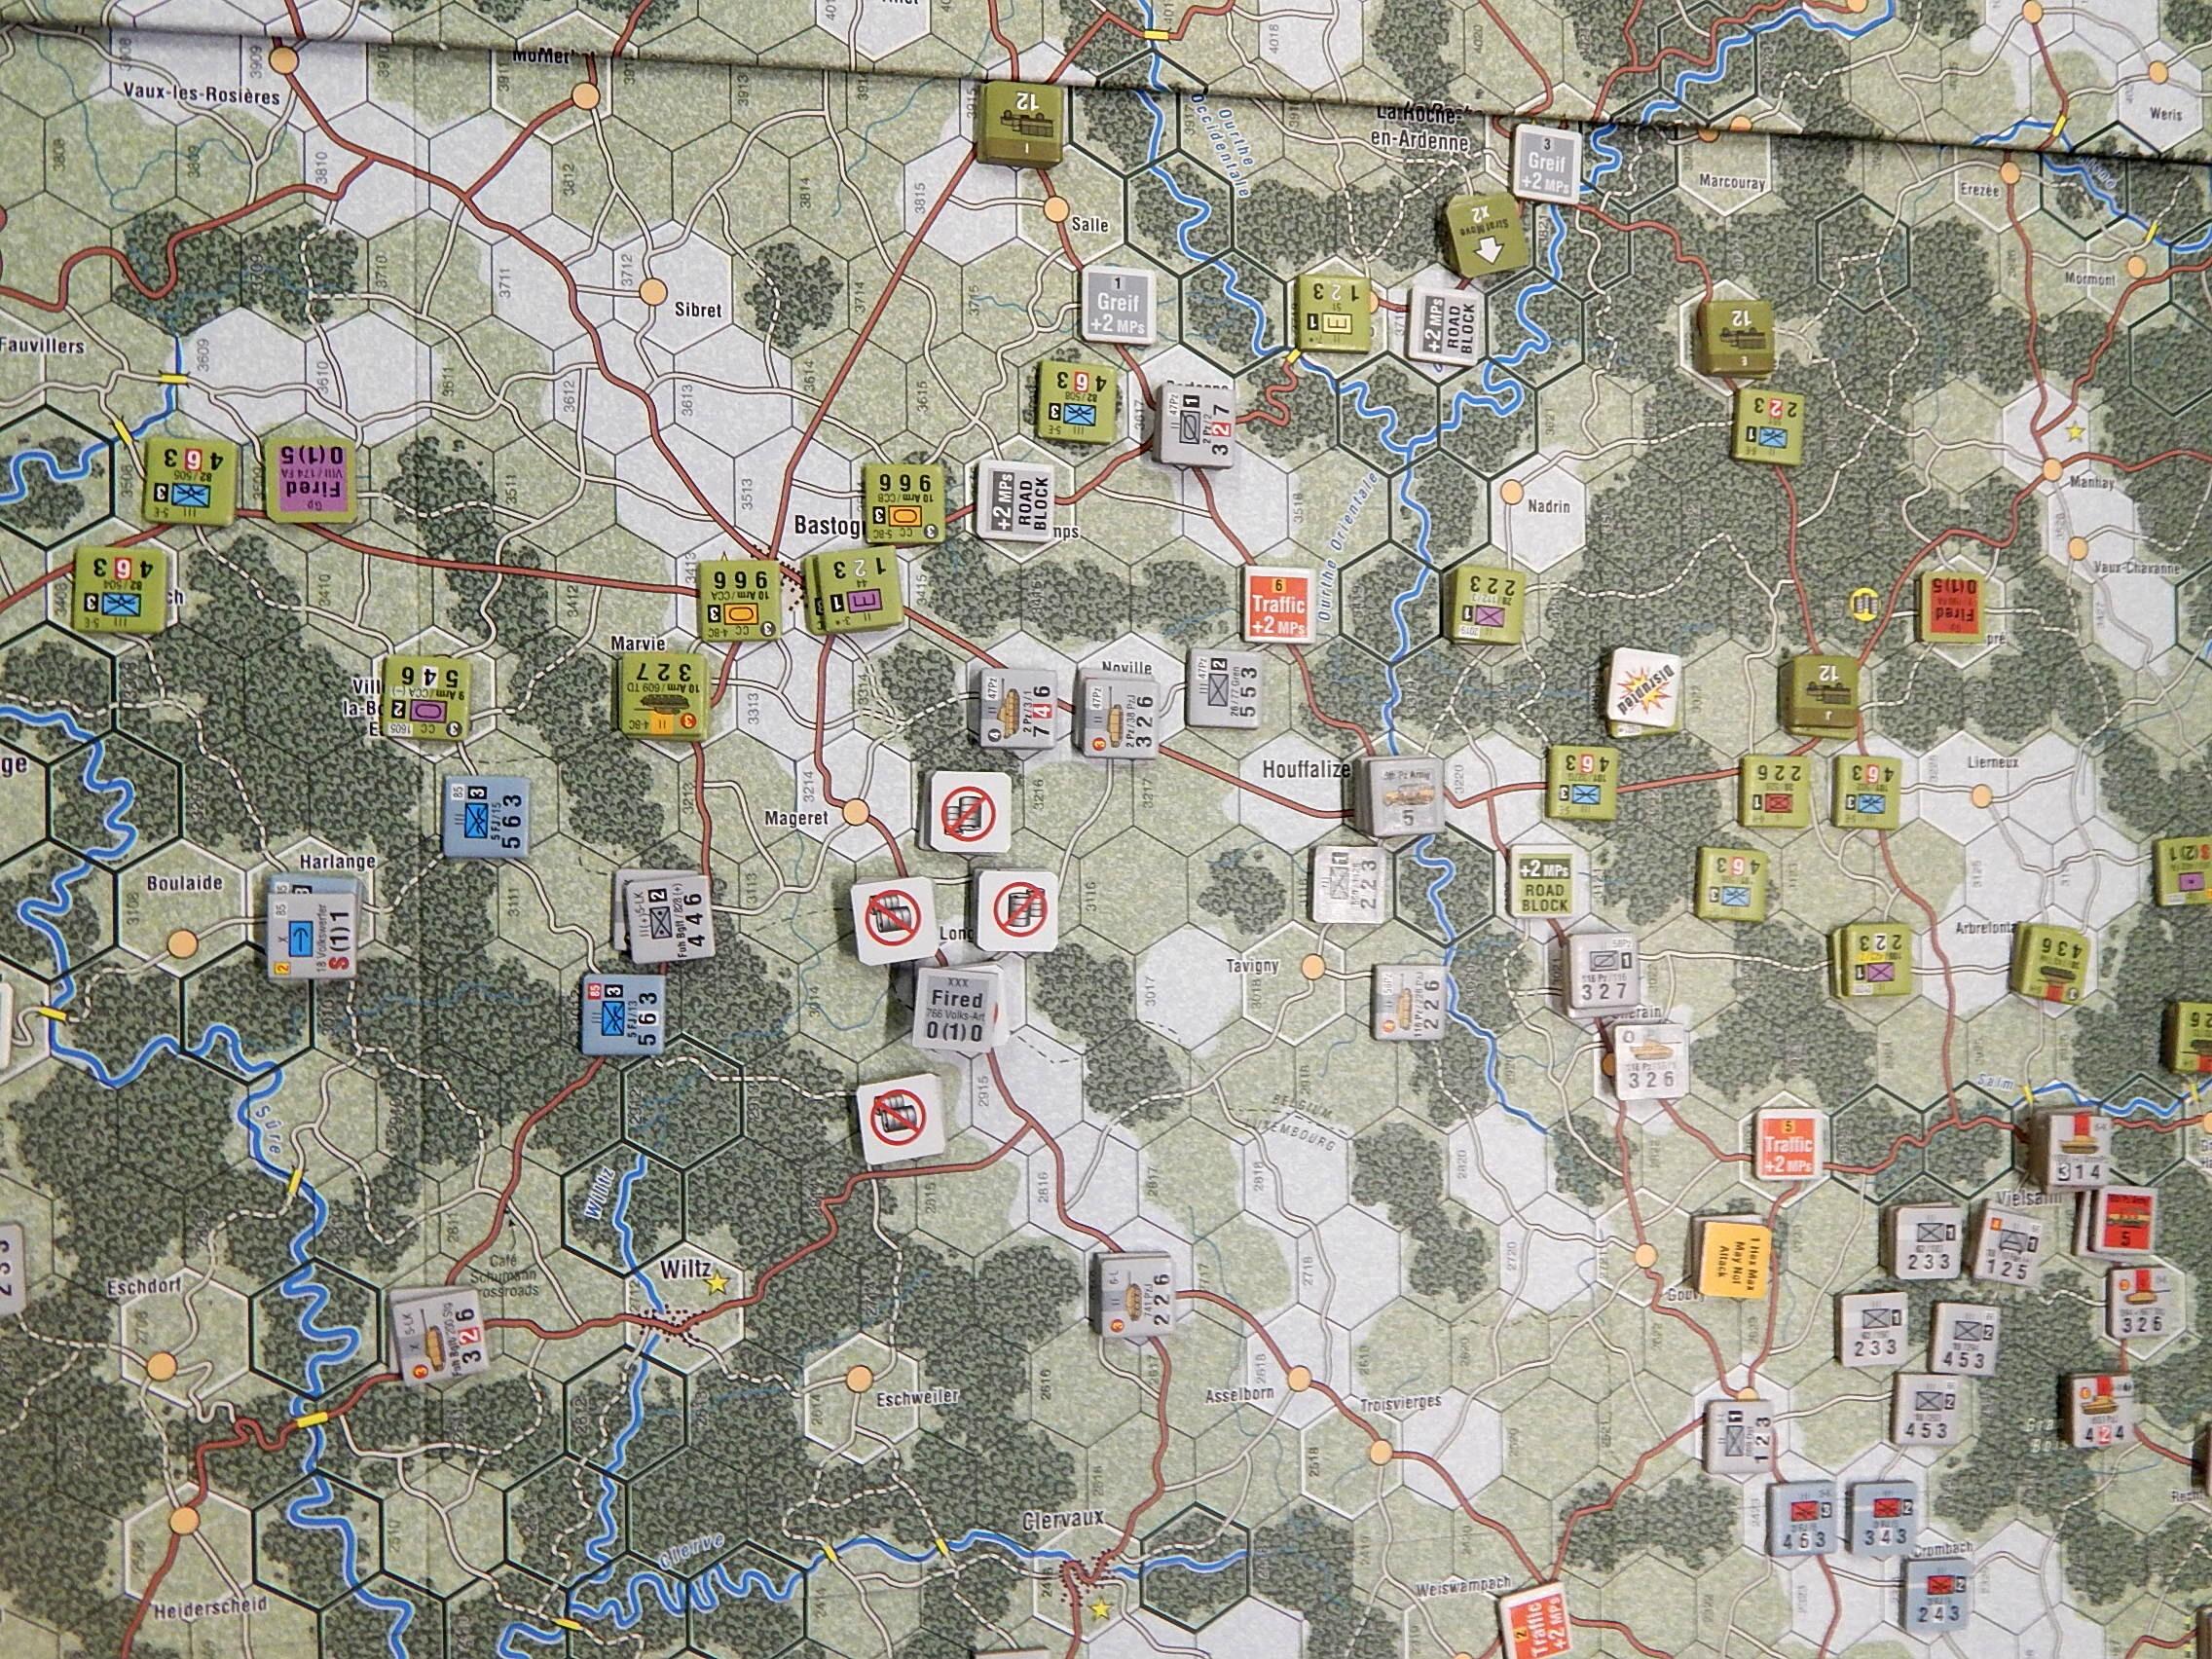 https://i.ibb.co/L5czG82/Ardennes-44-T7-B.jpg